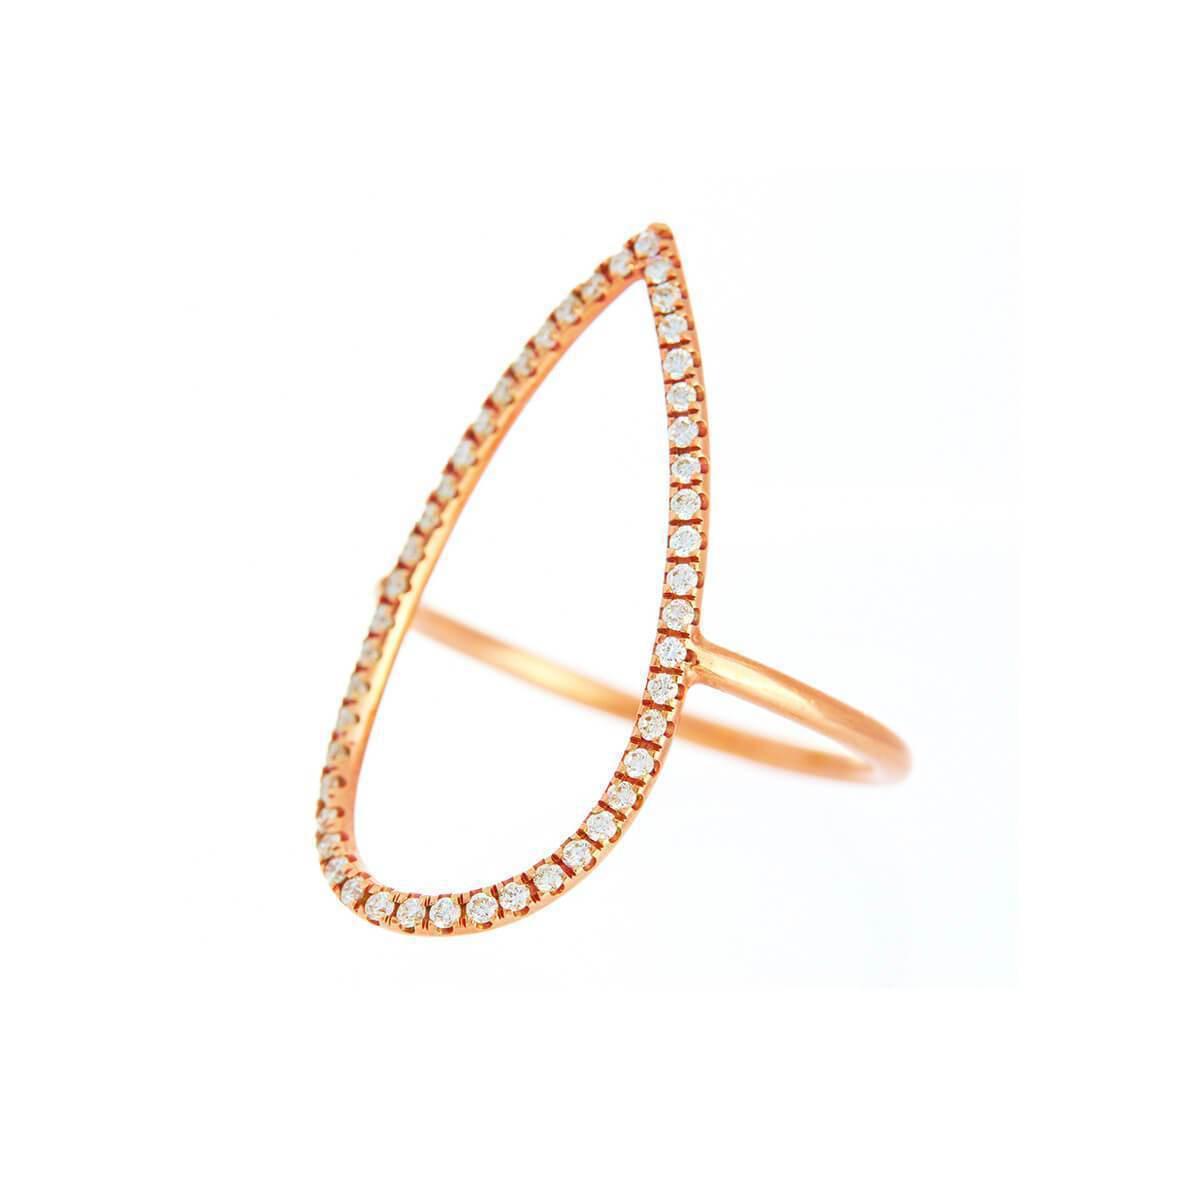 Alexis Danielle Jewelry Large Teardrop Ring in Metallic